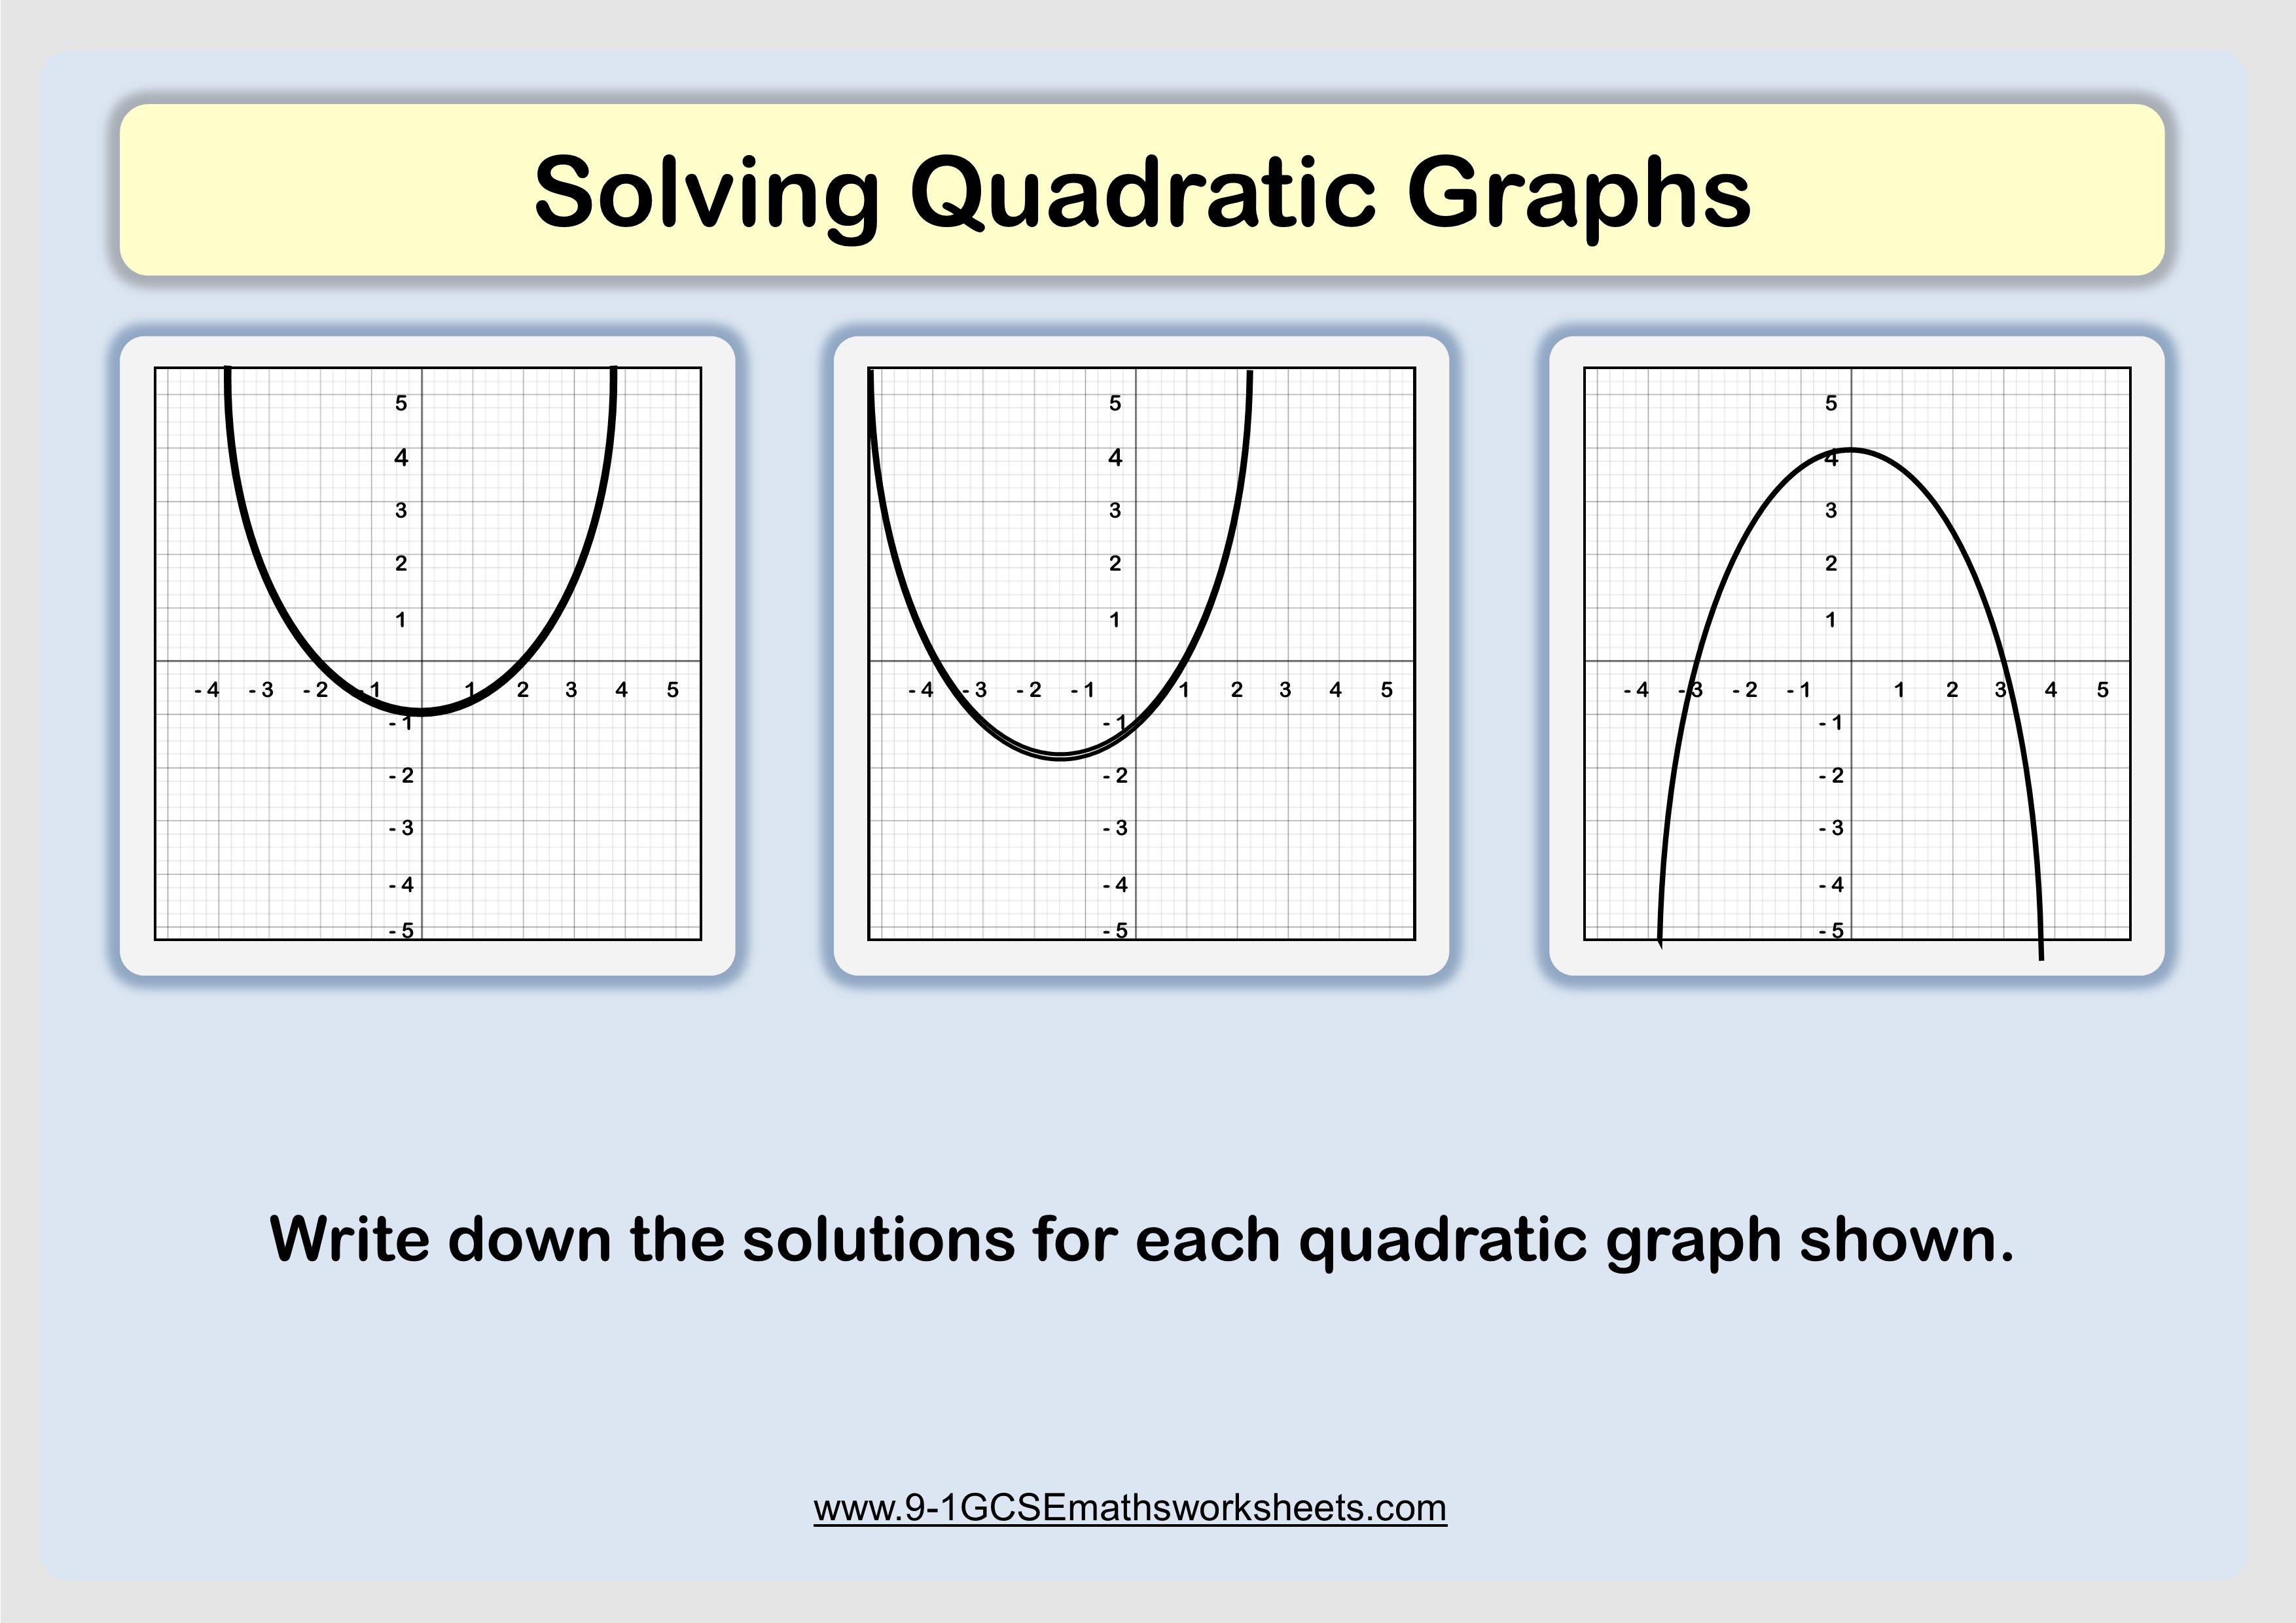 Solving Quadratic Graphs Example For Shading Regions Of Quadratic Graphs Great As A Starter Solving Inequalities Quadratics Solving [ 2480 x 3508 Pixel ]